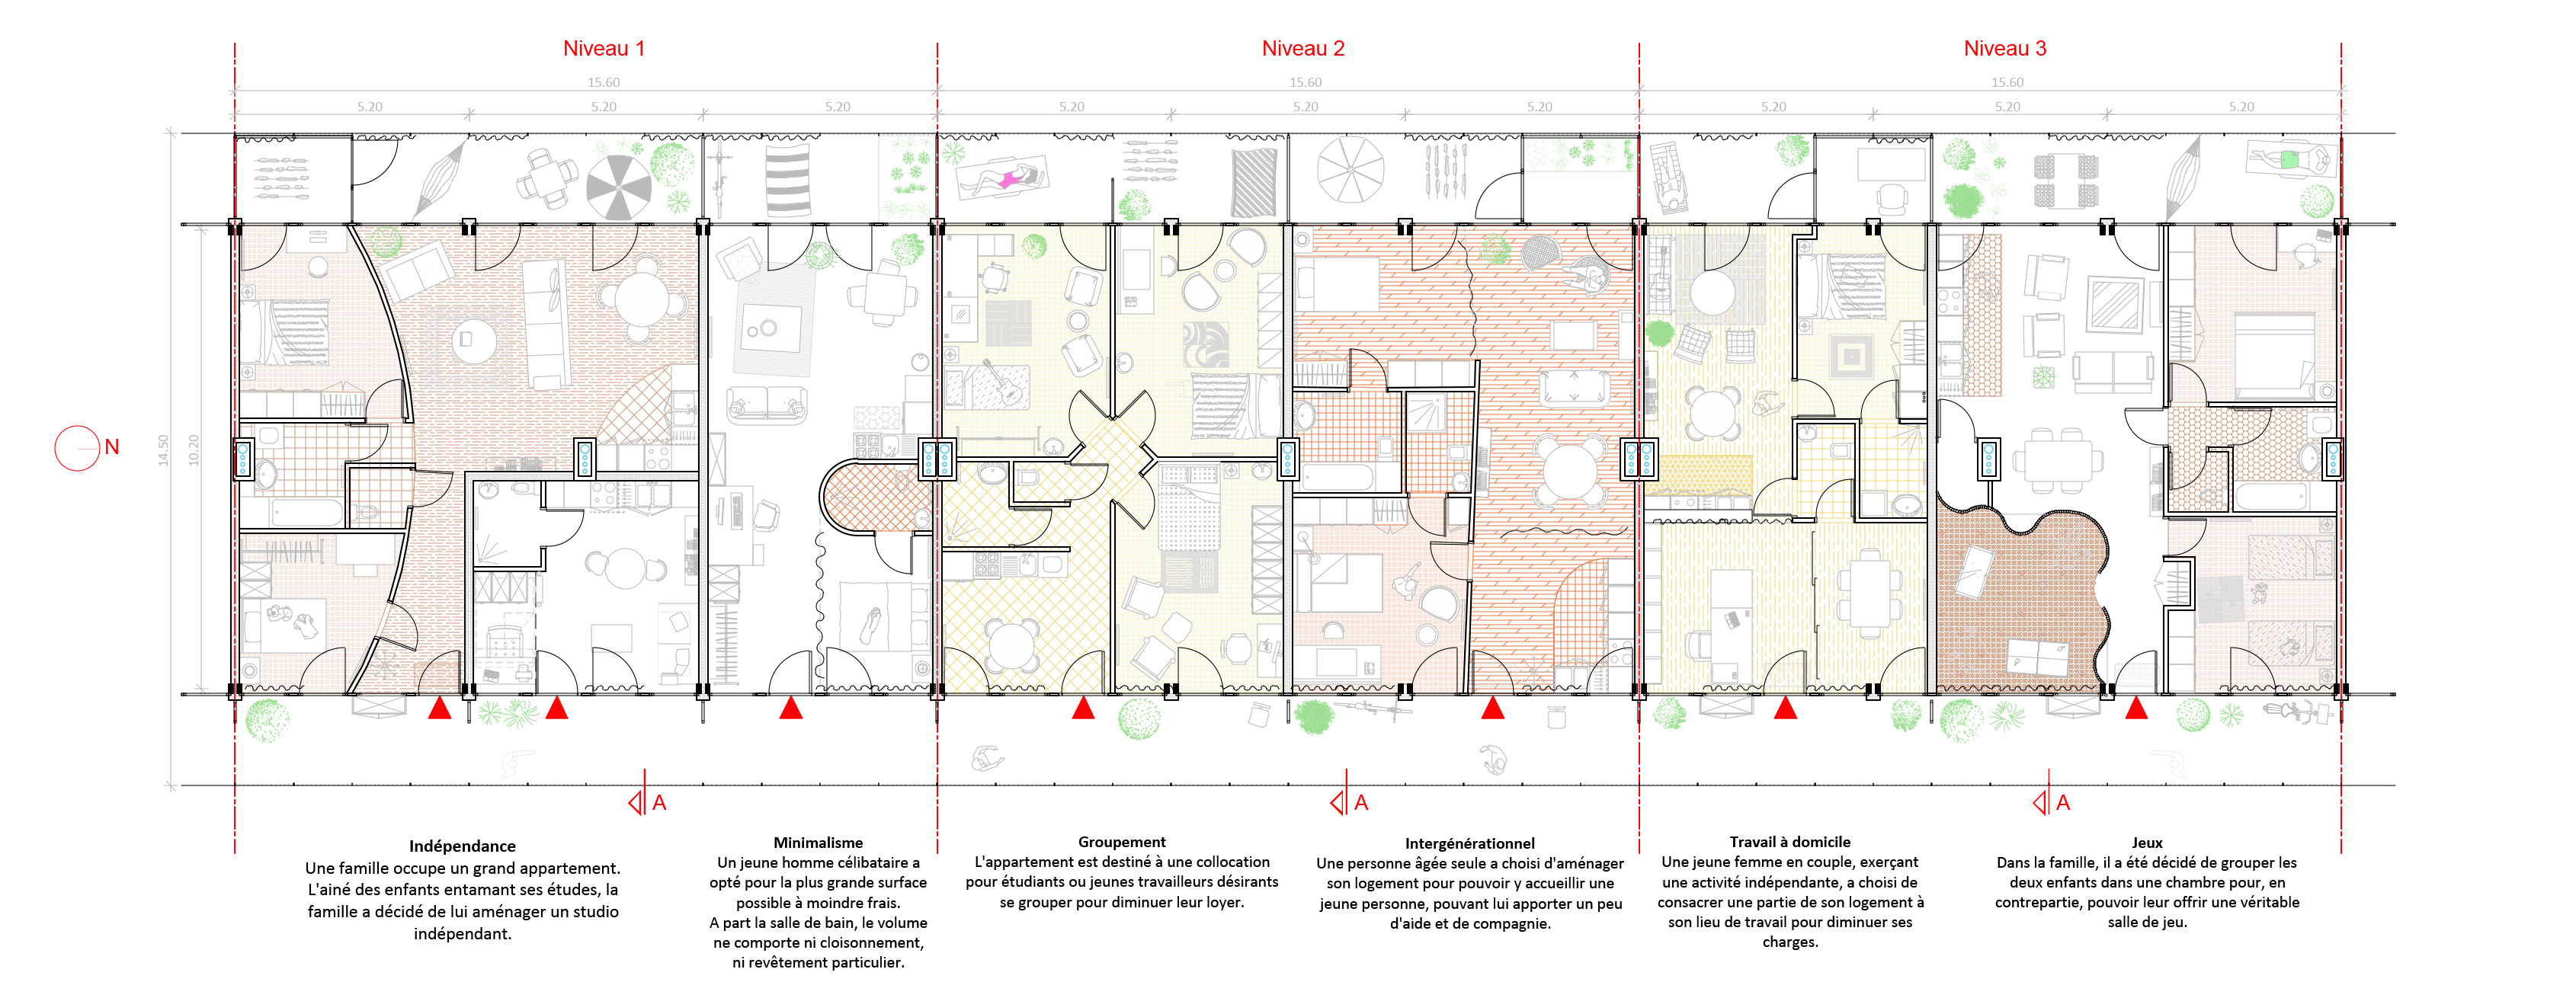 Habitat évolutif - plan